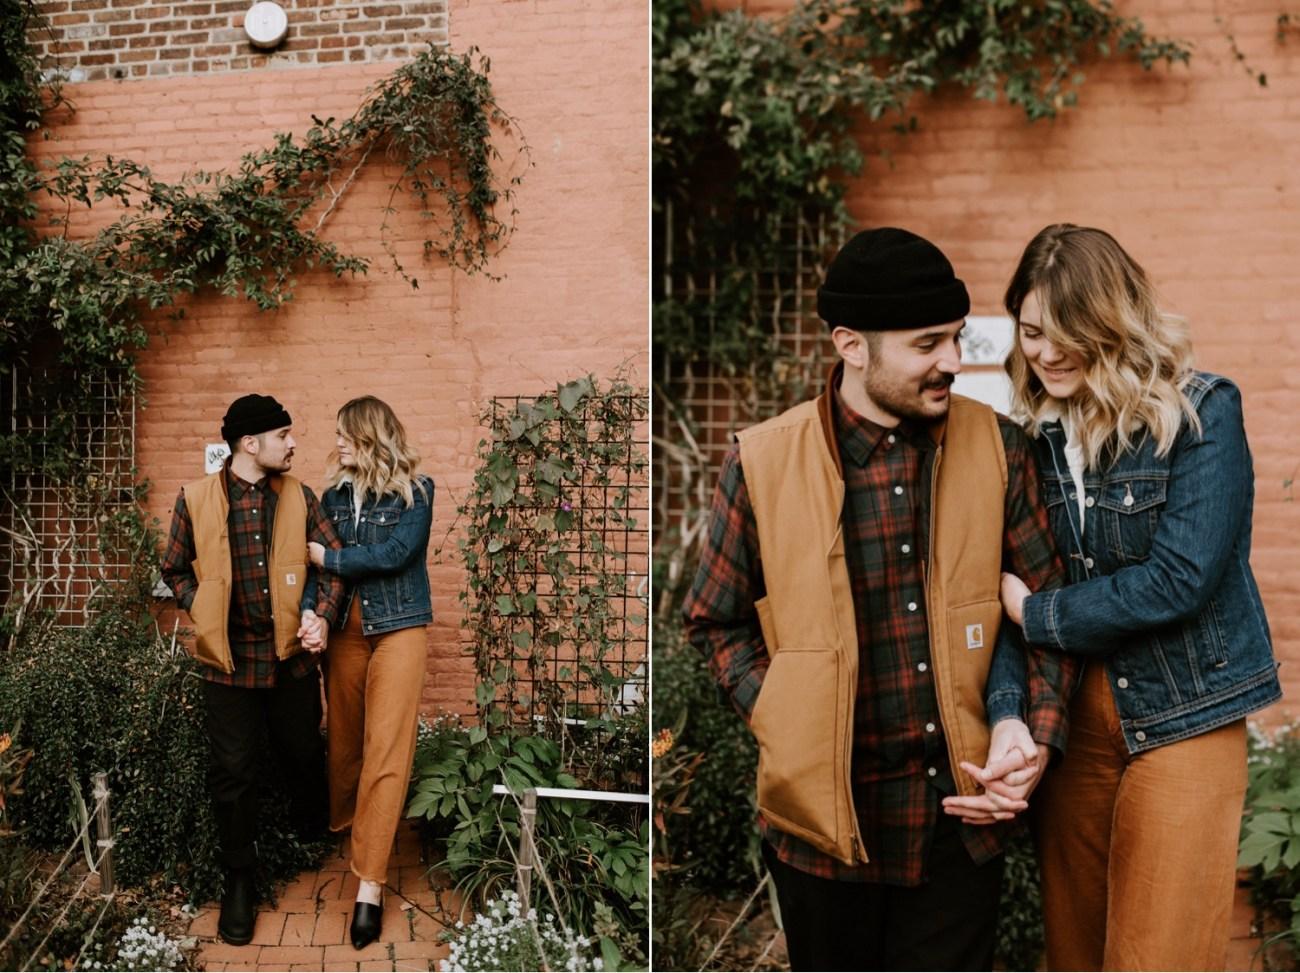 12 Brooklyn Wedding Photographer Brooklyn Engagement Session 501 Union Brooklyn Fall Engagement Session